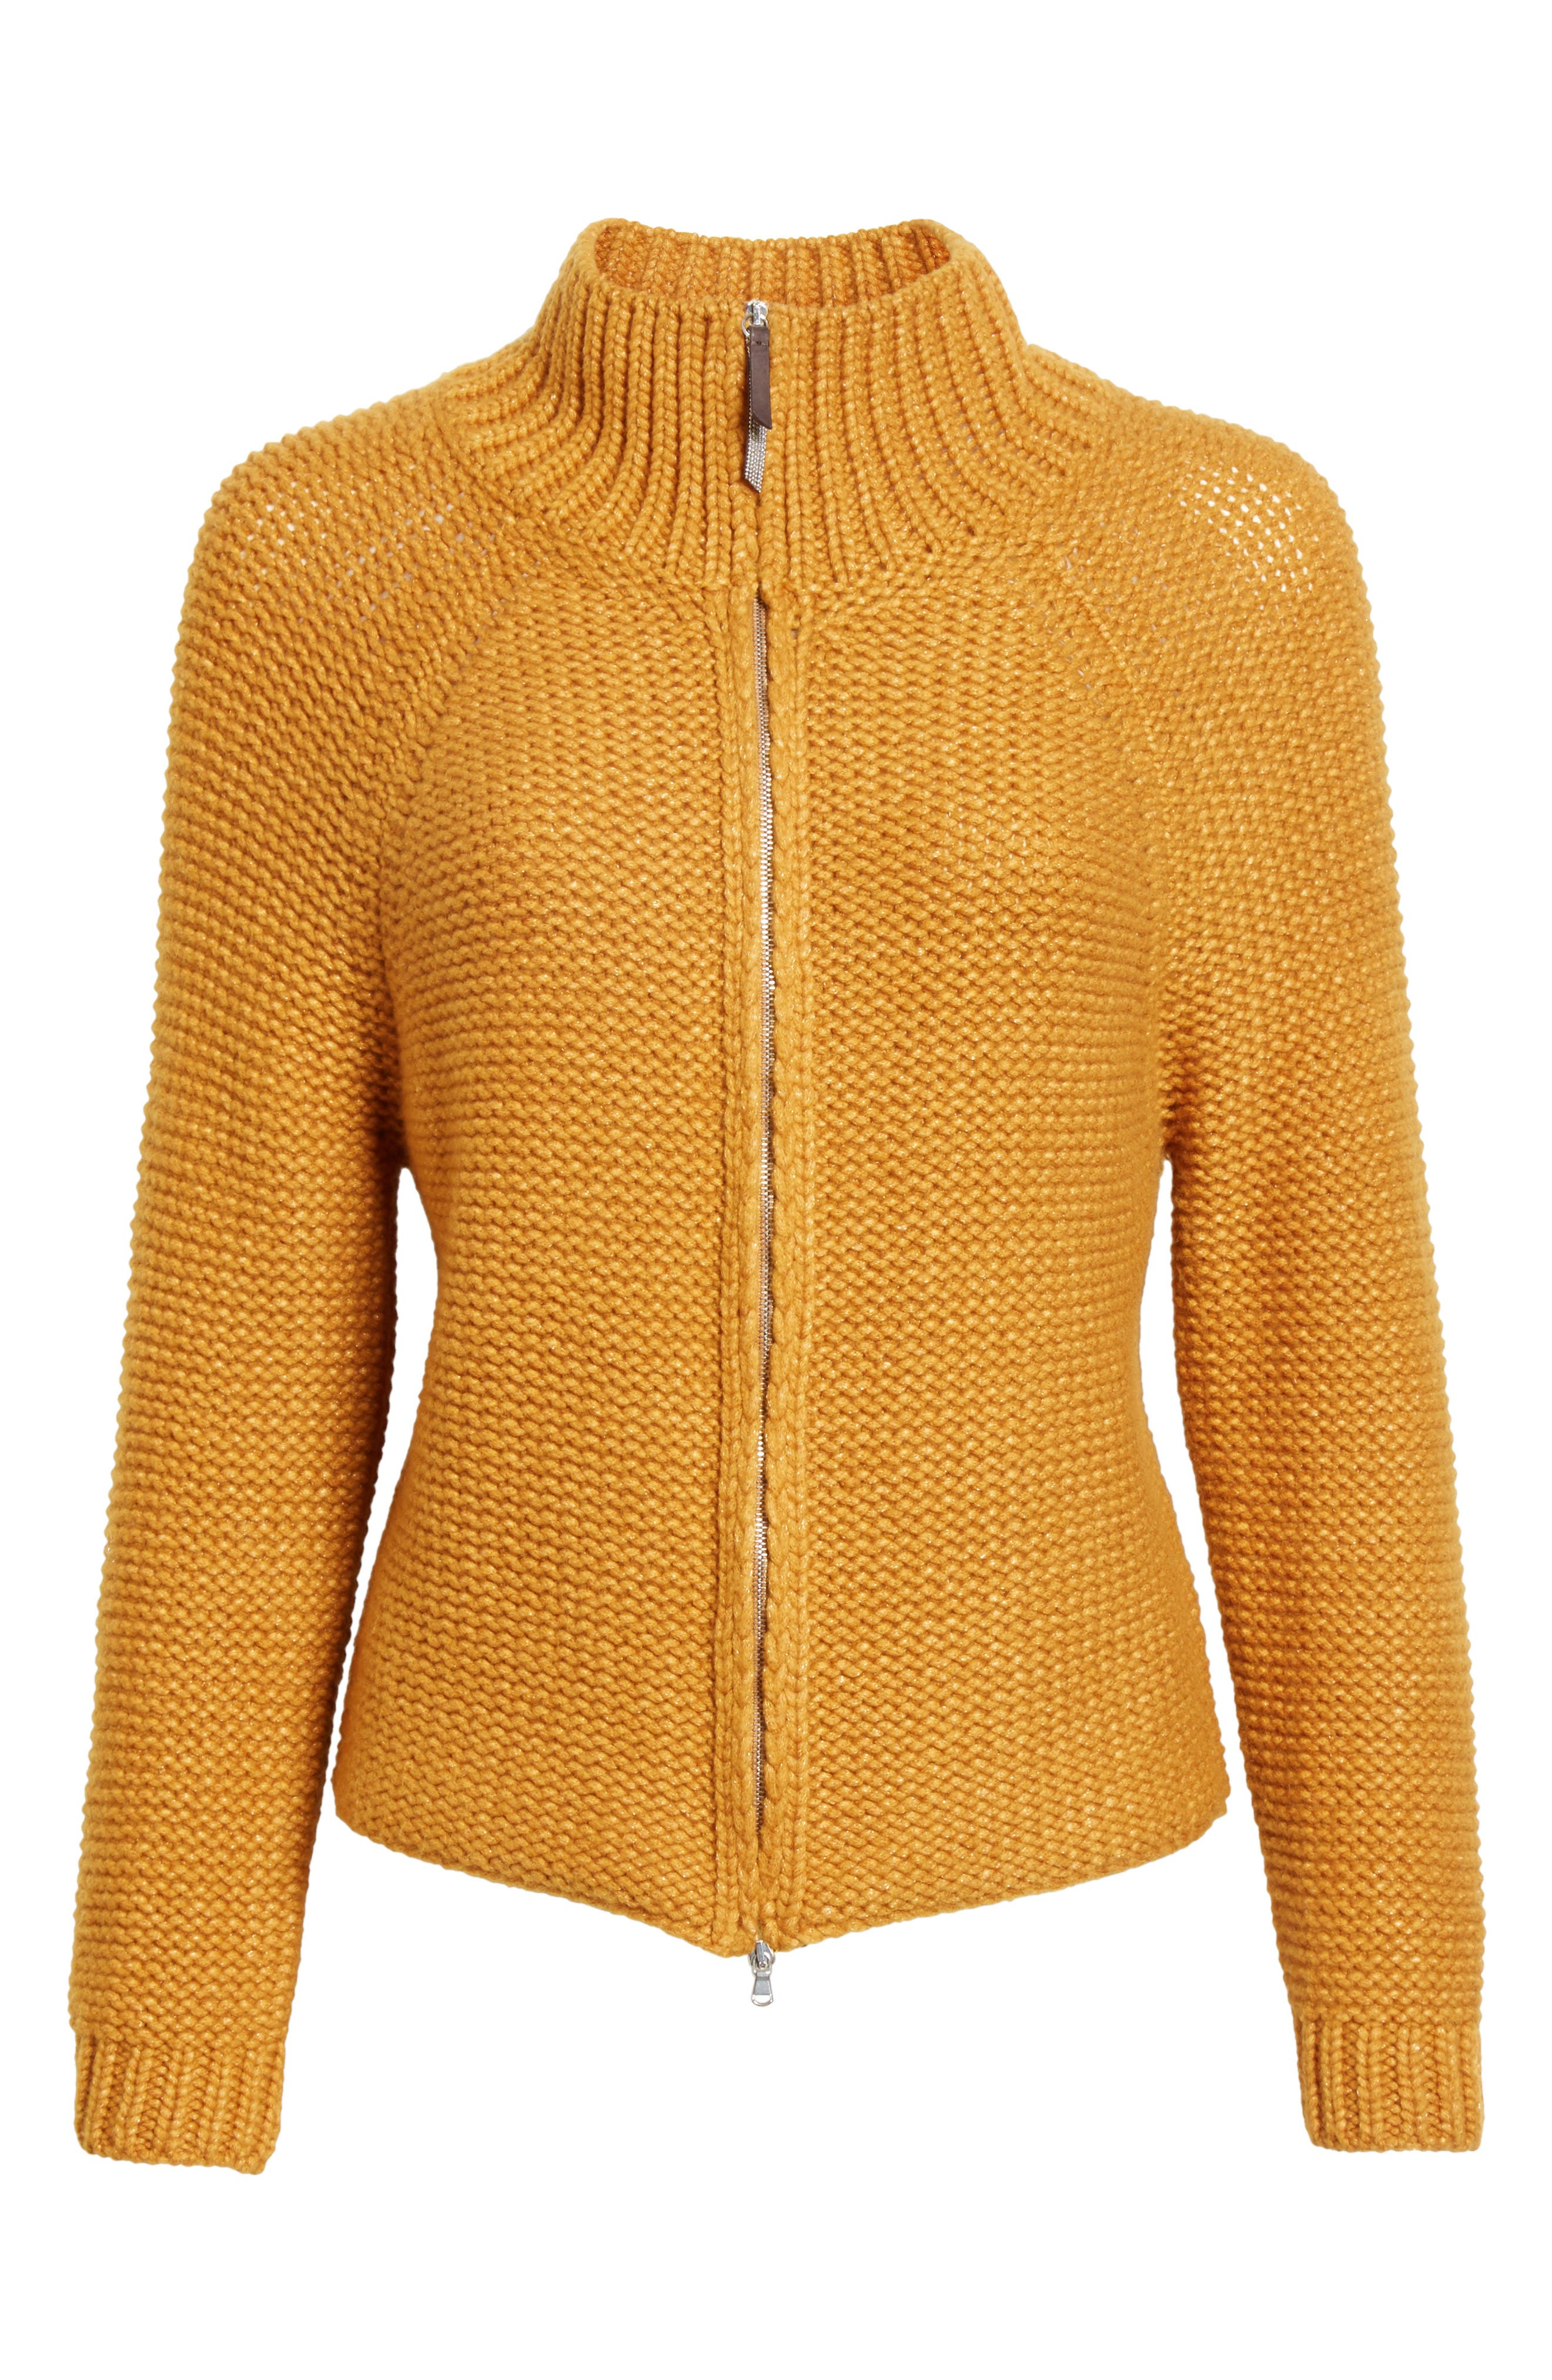 Alternate Image 4  - Fabiana Filippi Knit Wool Blend Cardigan